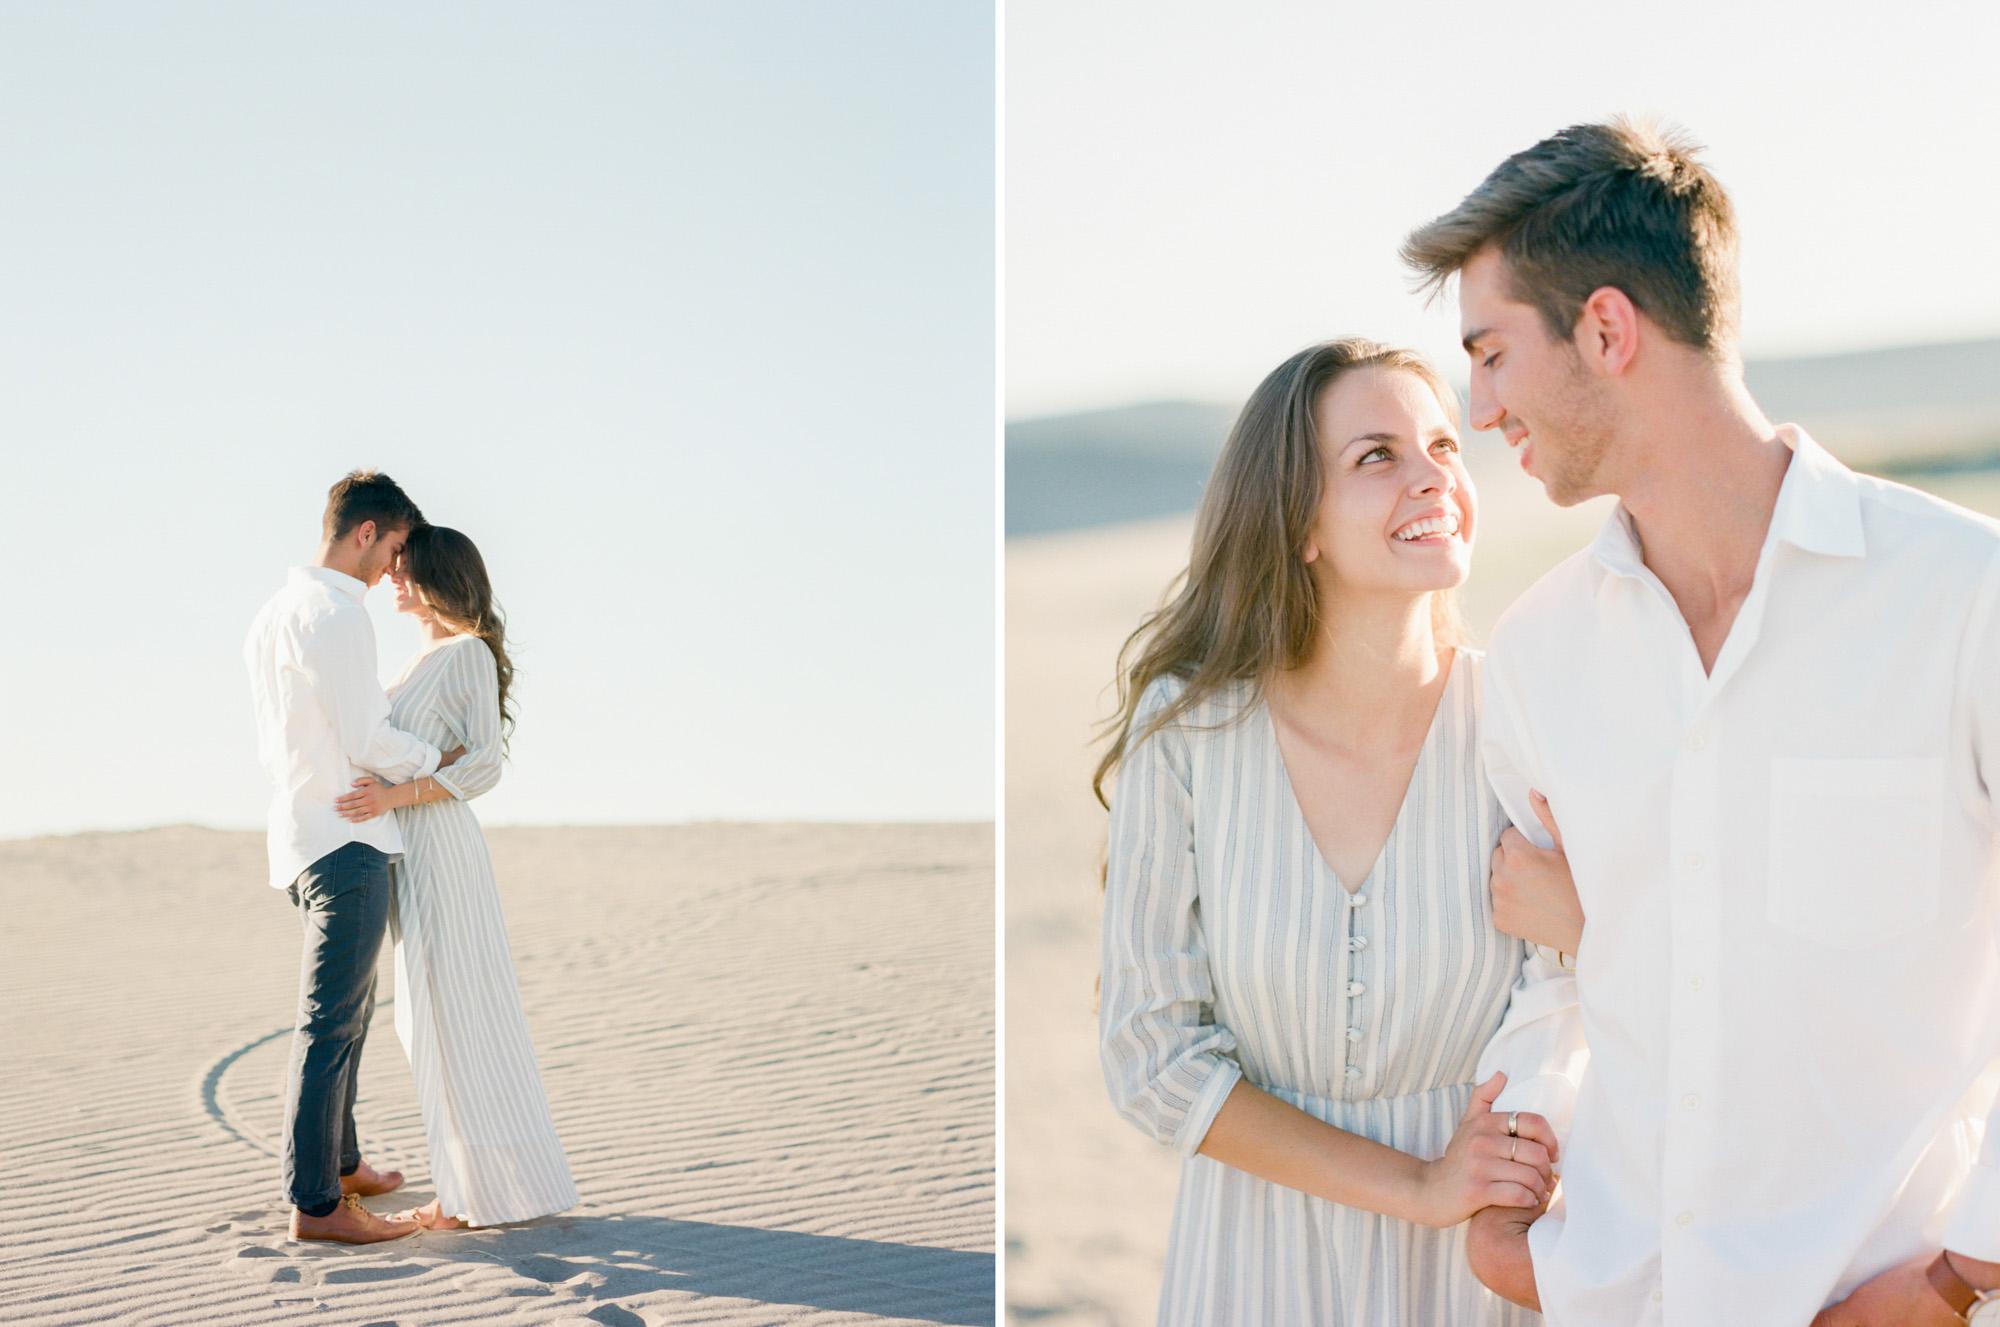 boise-idaho-film-wedding-photographer-2-2.jpg